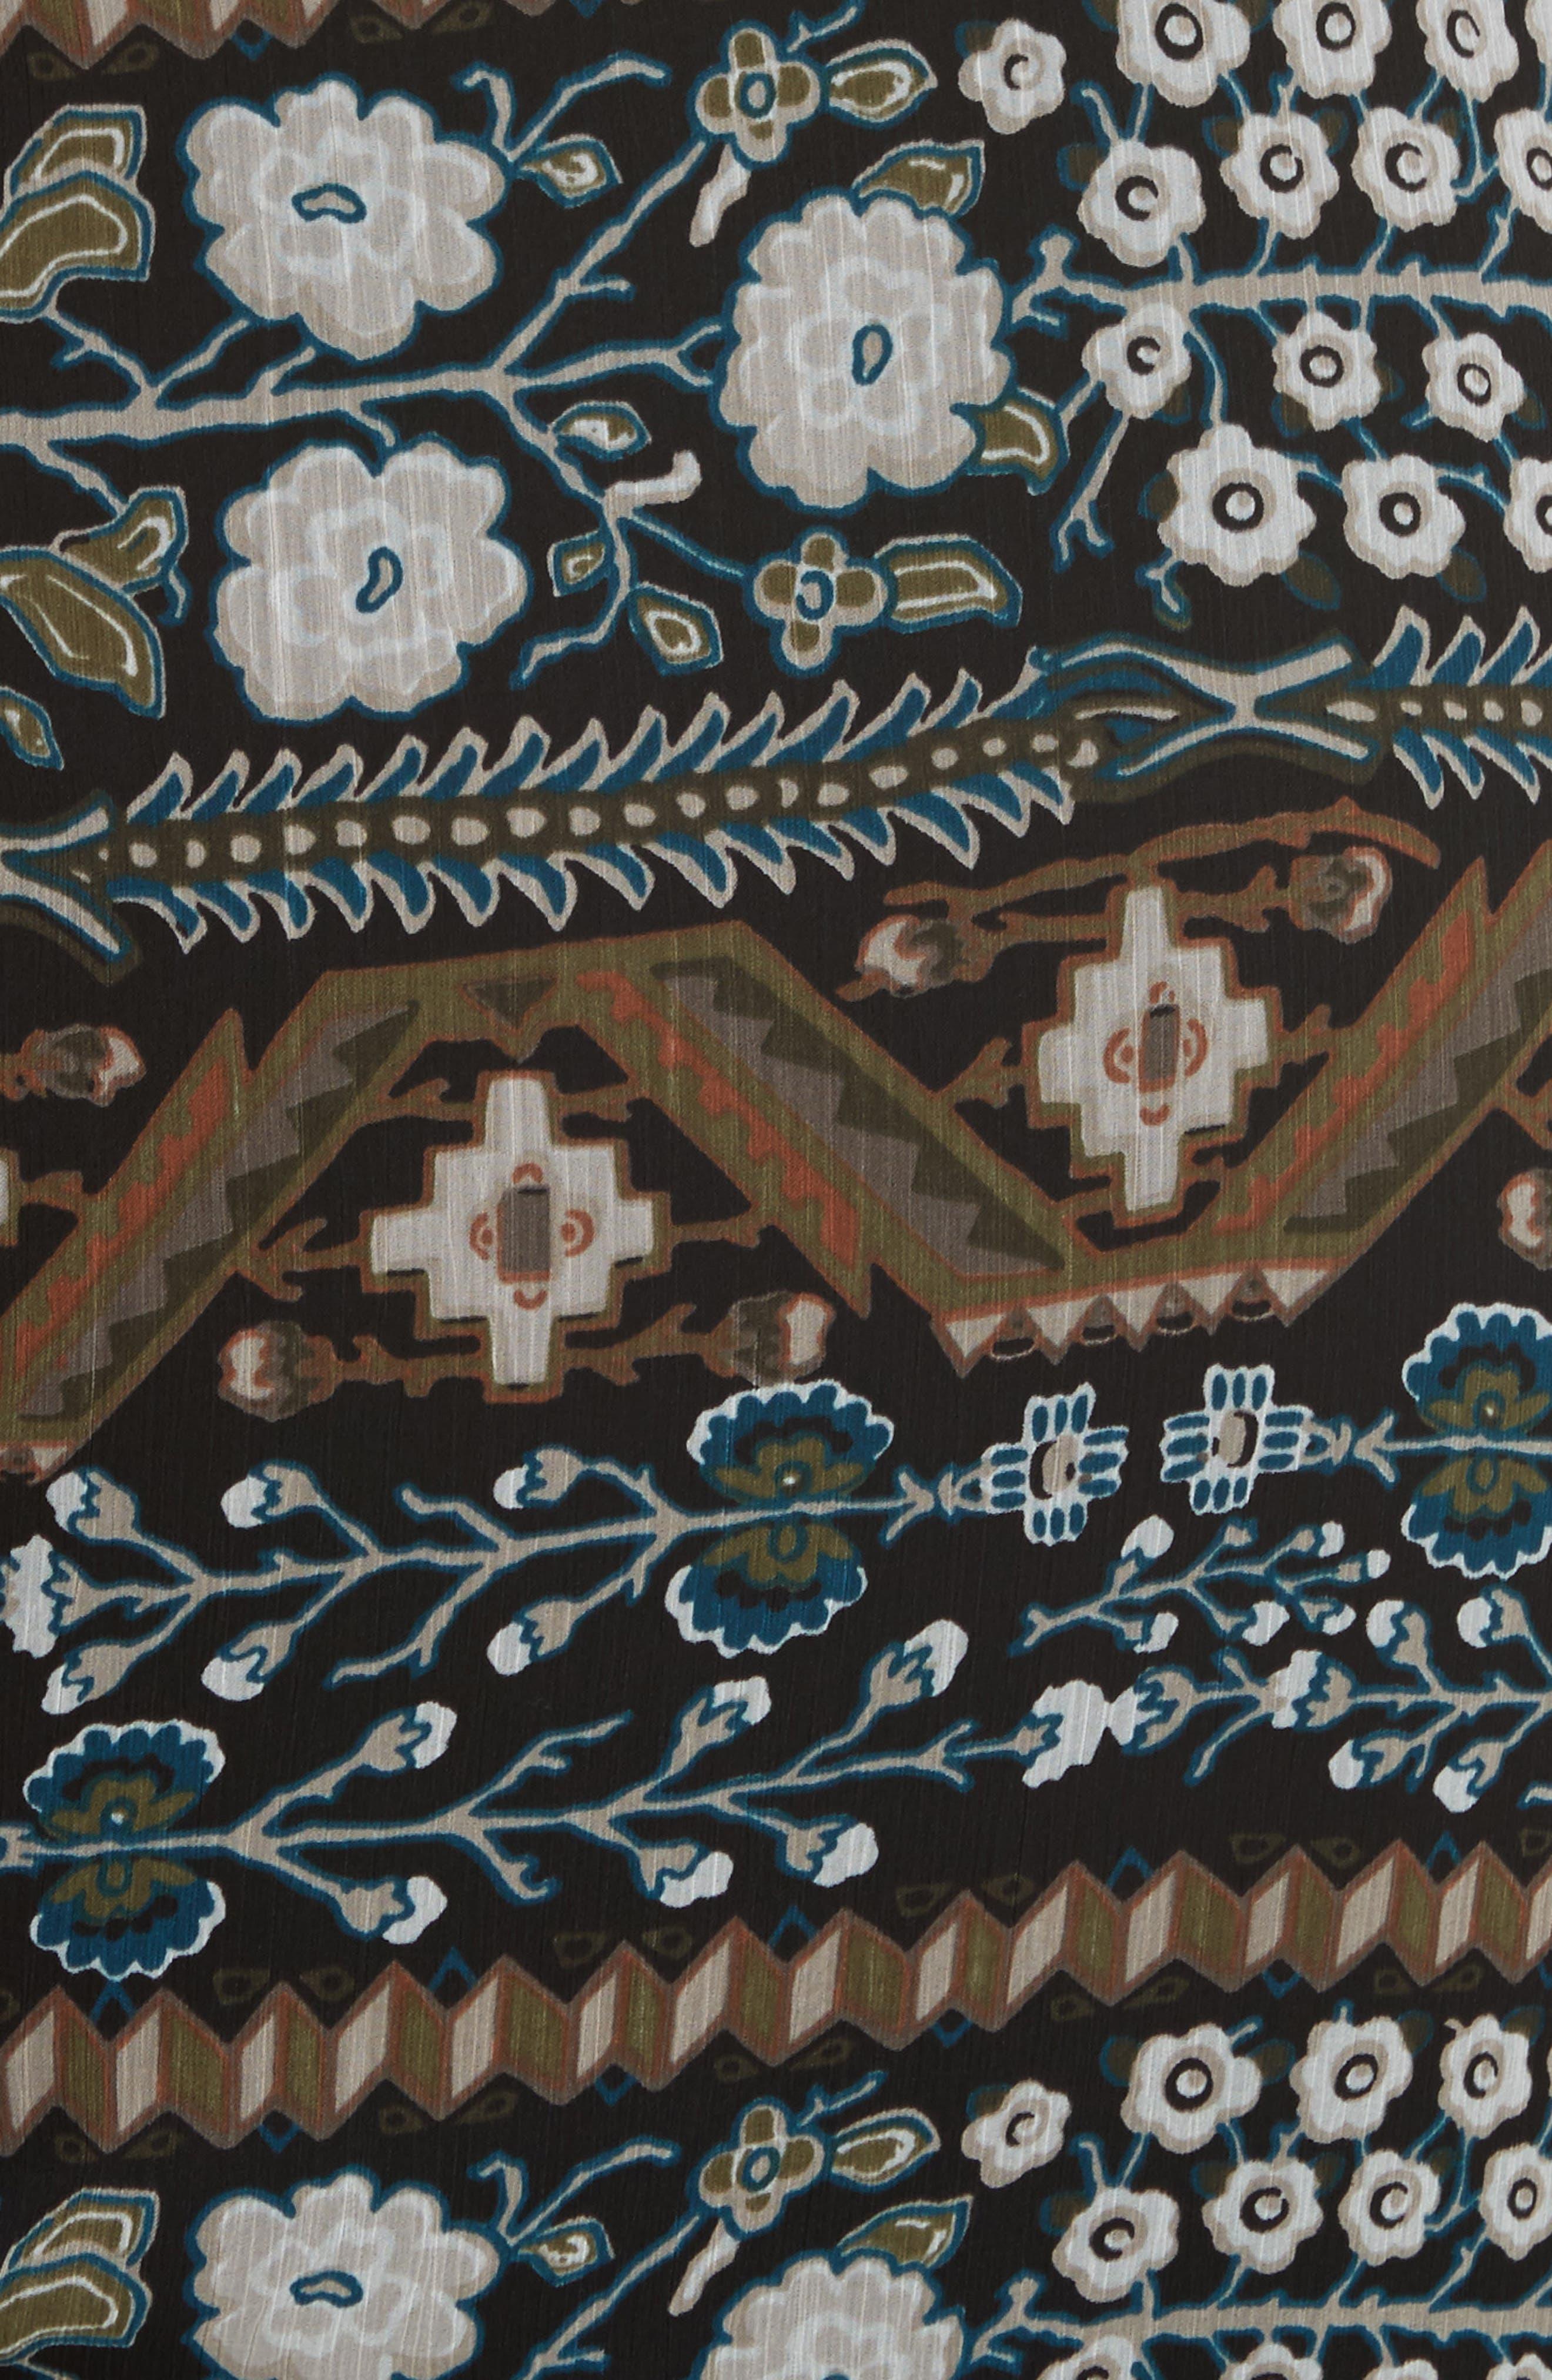 Perla Ruched Midi Dress,                             Alternate thumbnail 5, color,                             Army/ Black Multi